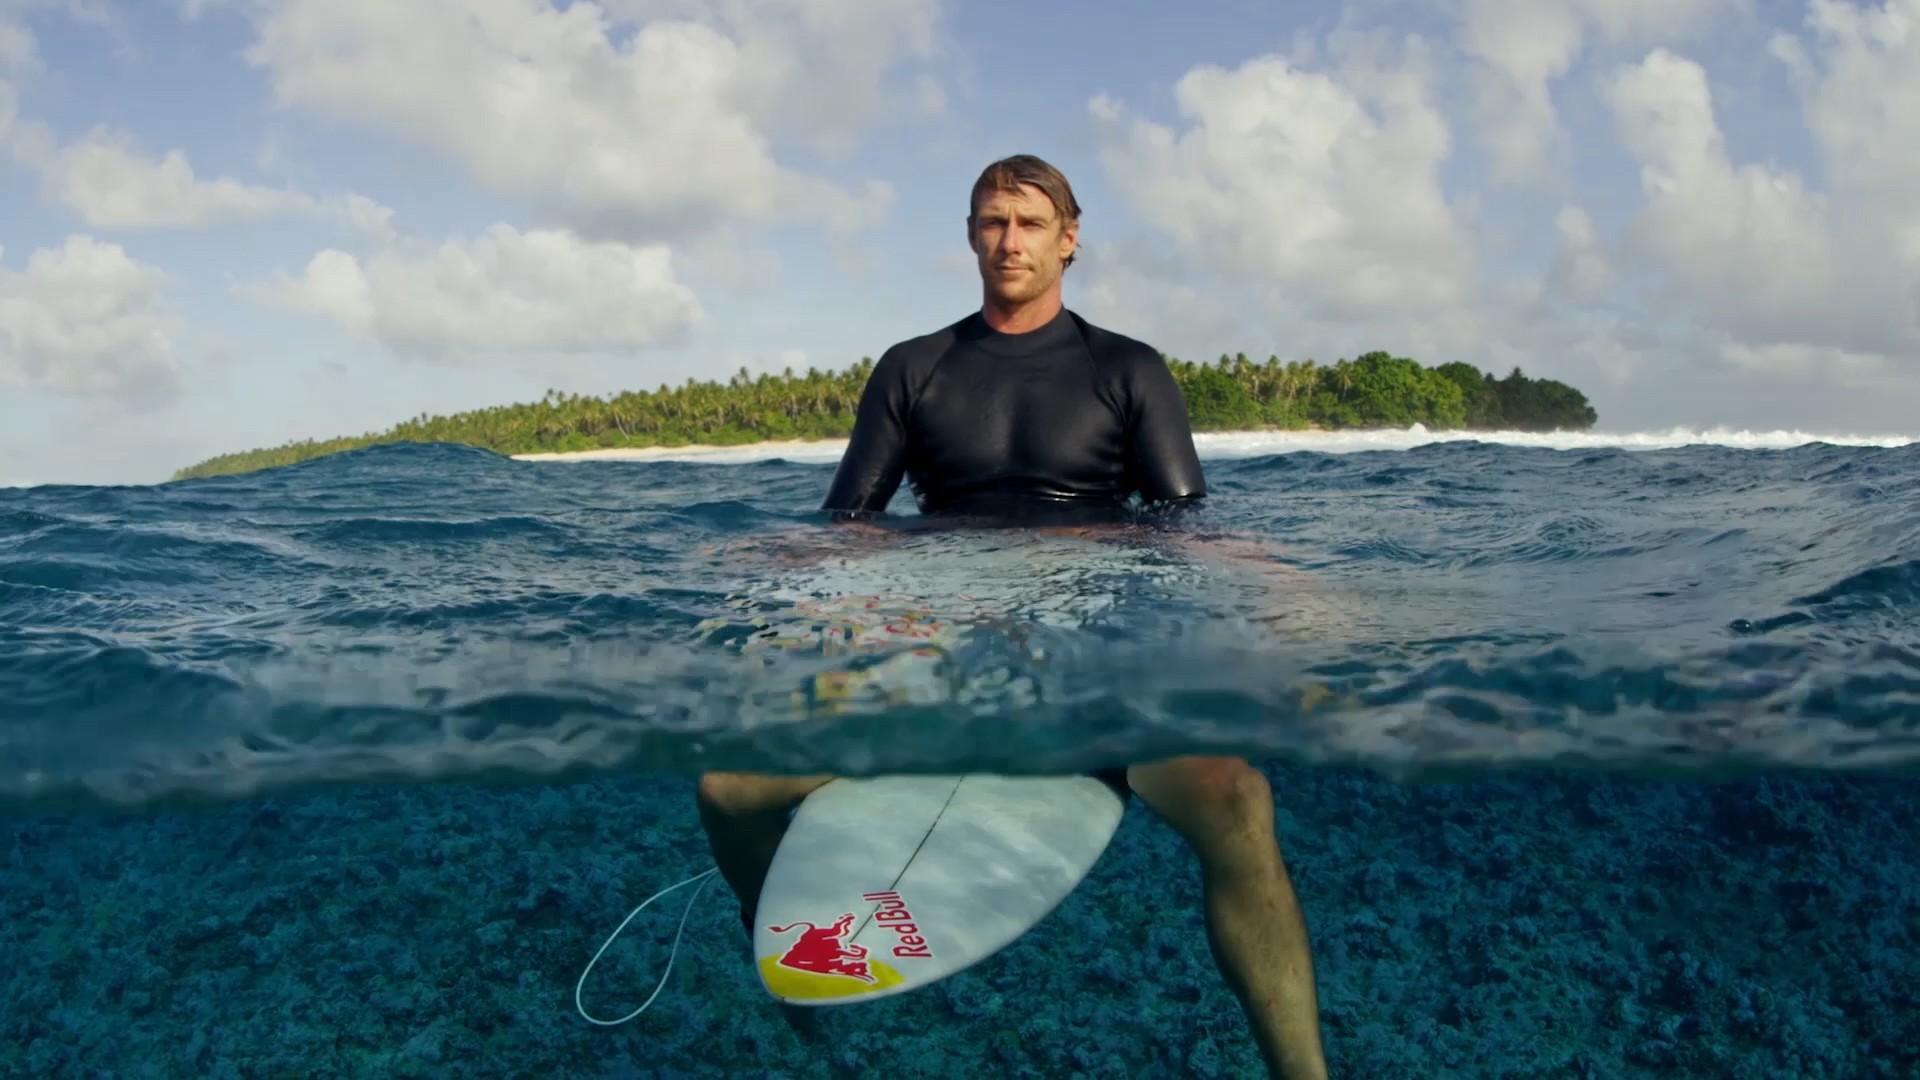 Ian Walsh Talks Surfing 60+ Foot Waves